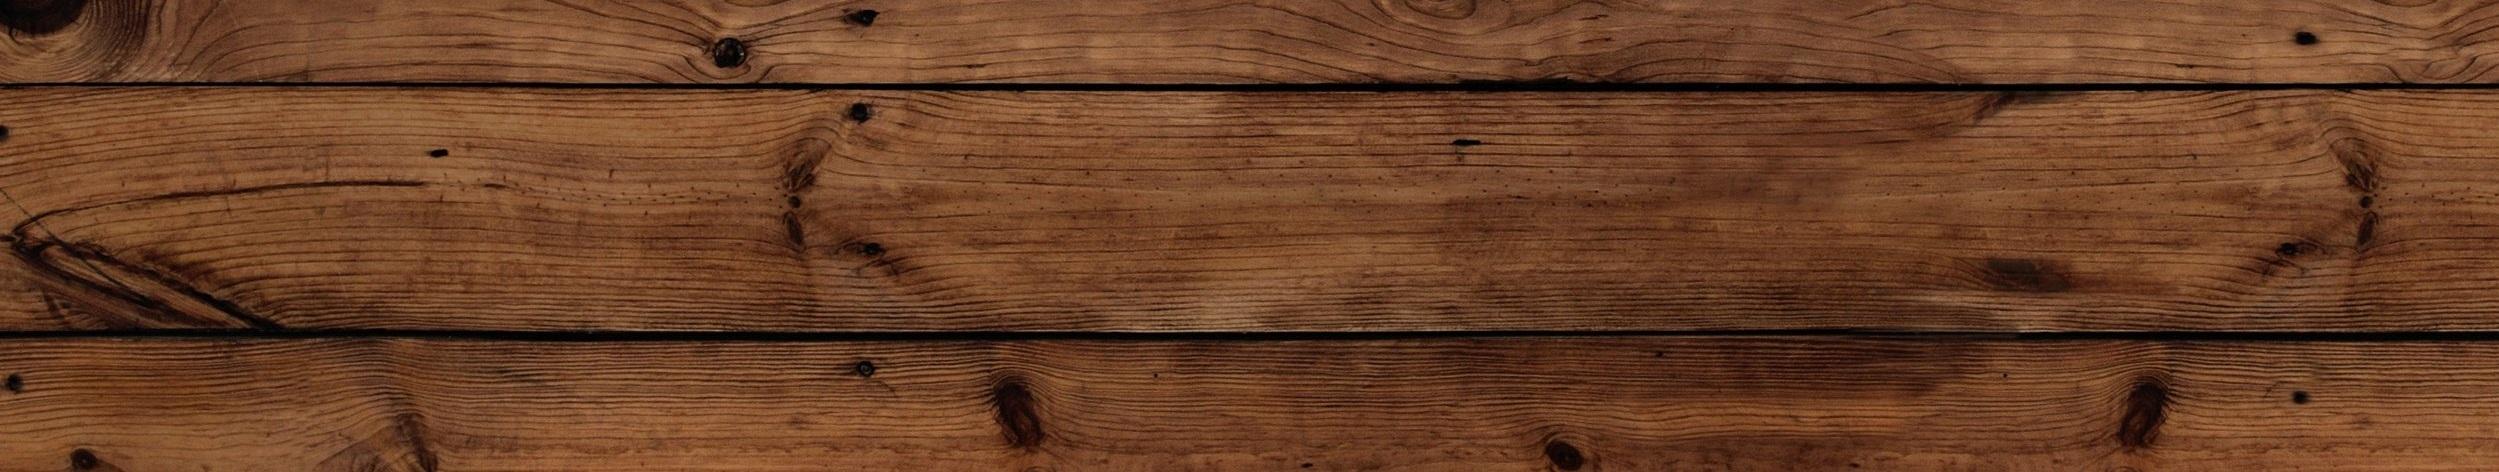 wood+plank.jpg